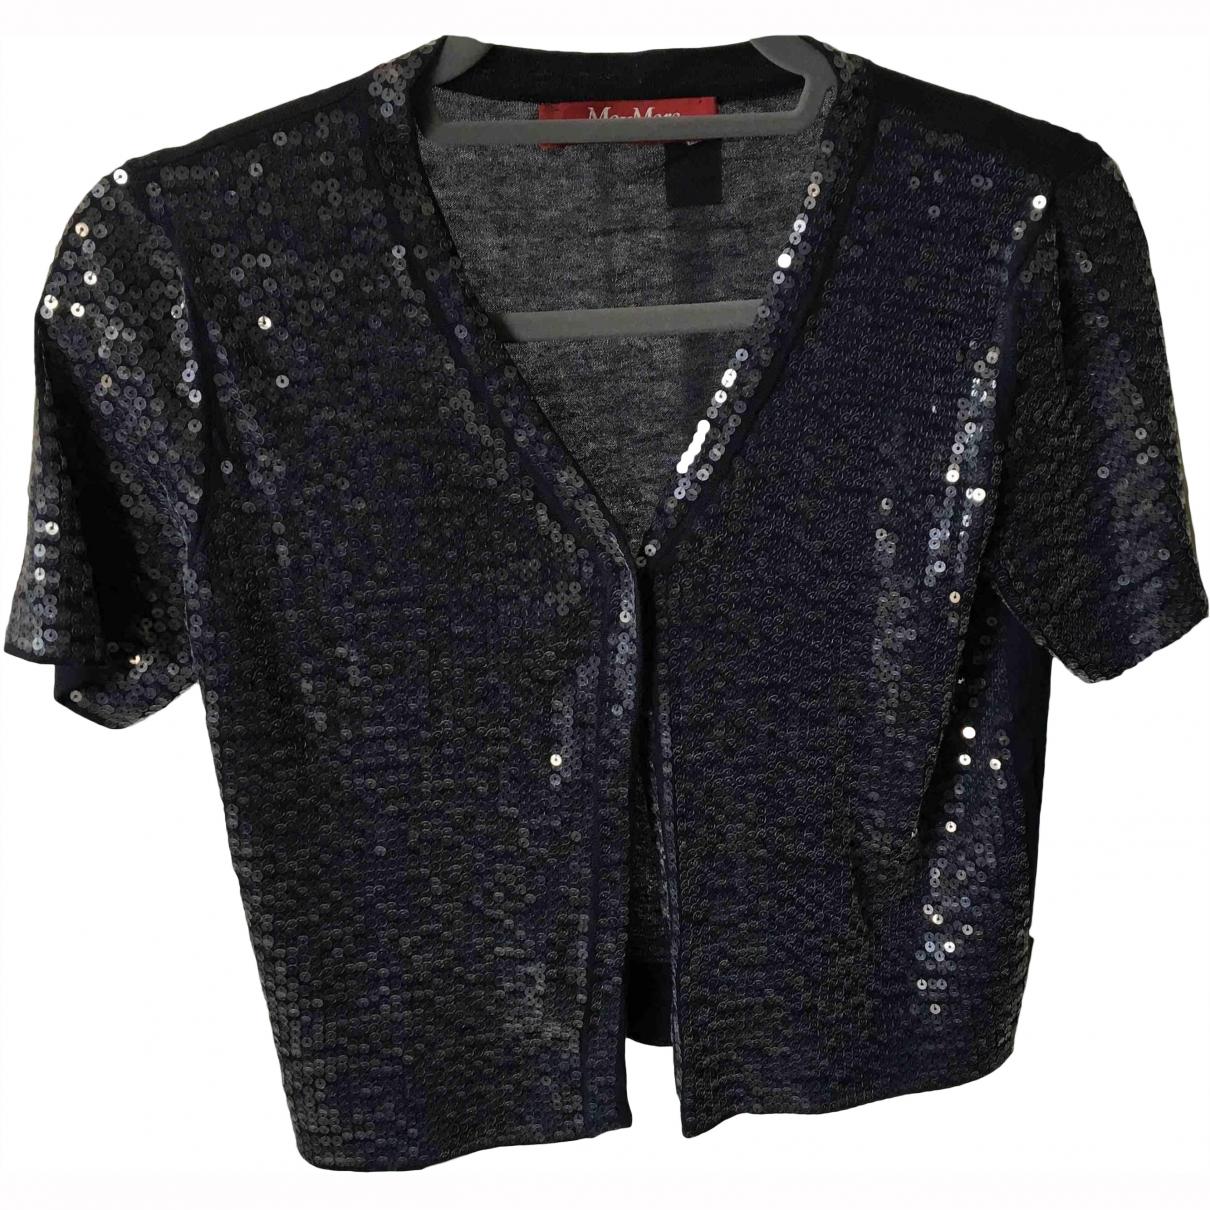 Max Mara \N Blue Cotton Knitwear for Women S